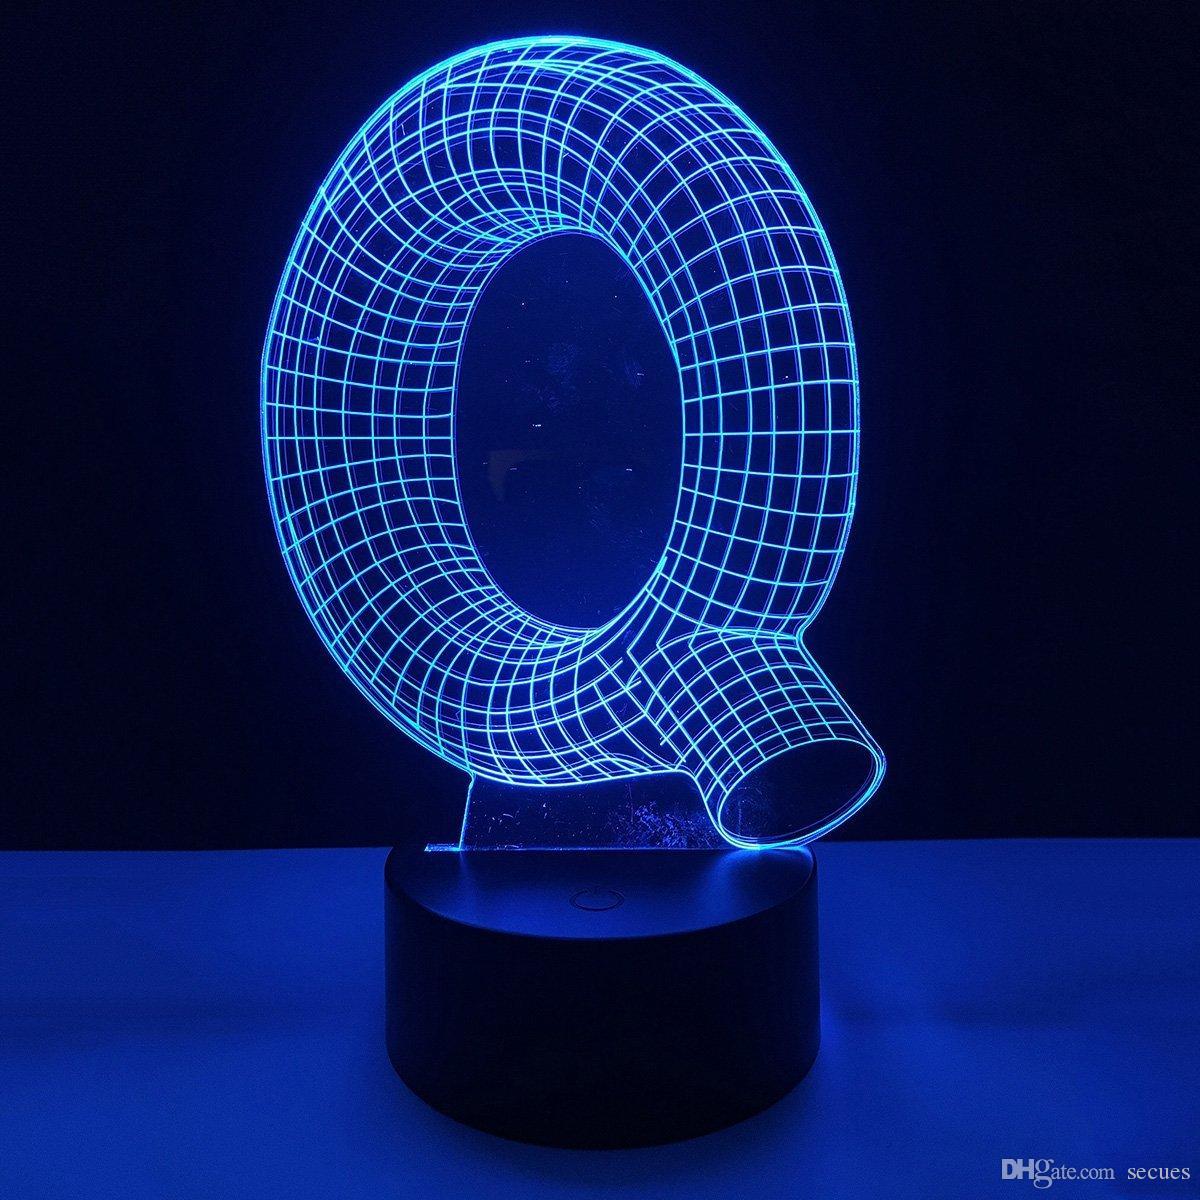 Q Shape 3D Illusion LED Lamp Letters Decoration Light DC 5V USB Powered 5th Battery Wholesale Free Shipping